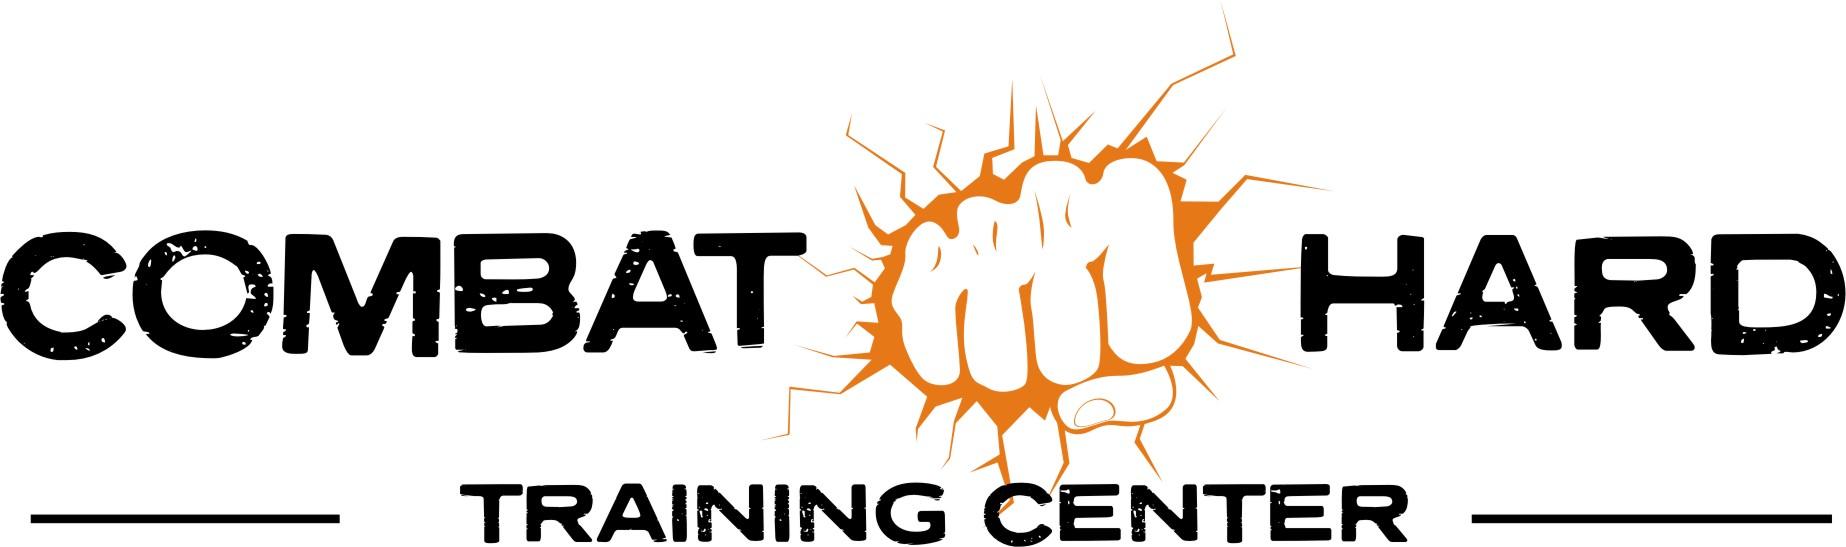 Body Combat Logo at Combat Hard we Promote